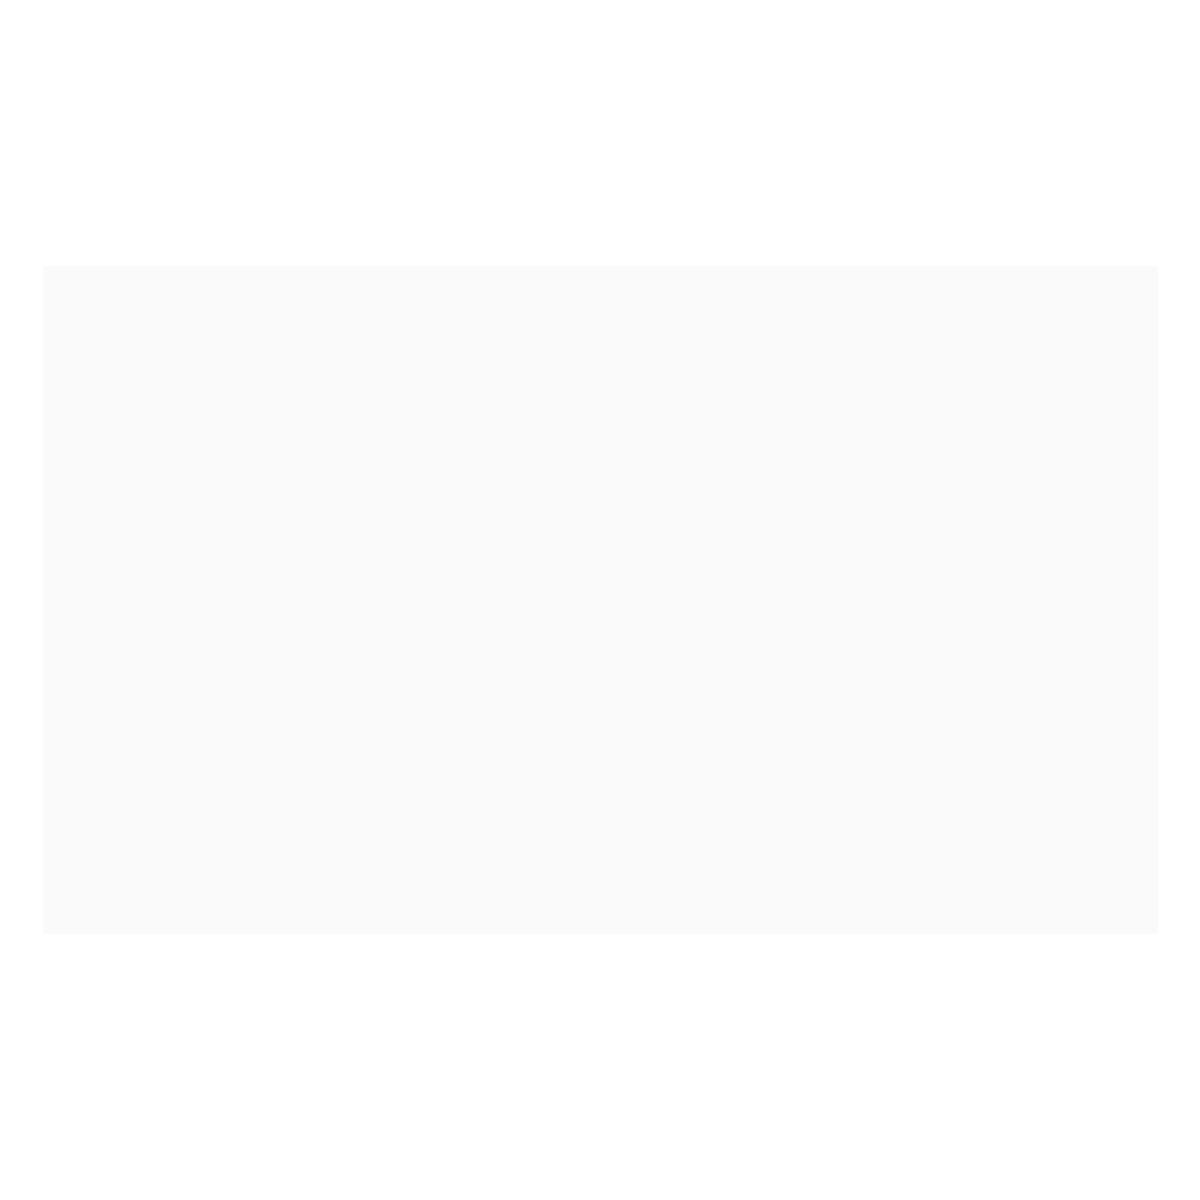 Mayólica Blanco Brillante - 24X40 cm - 1.76 m2